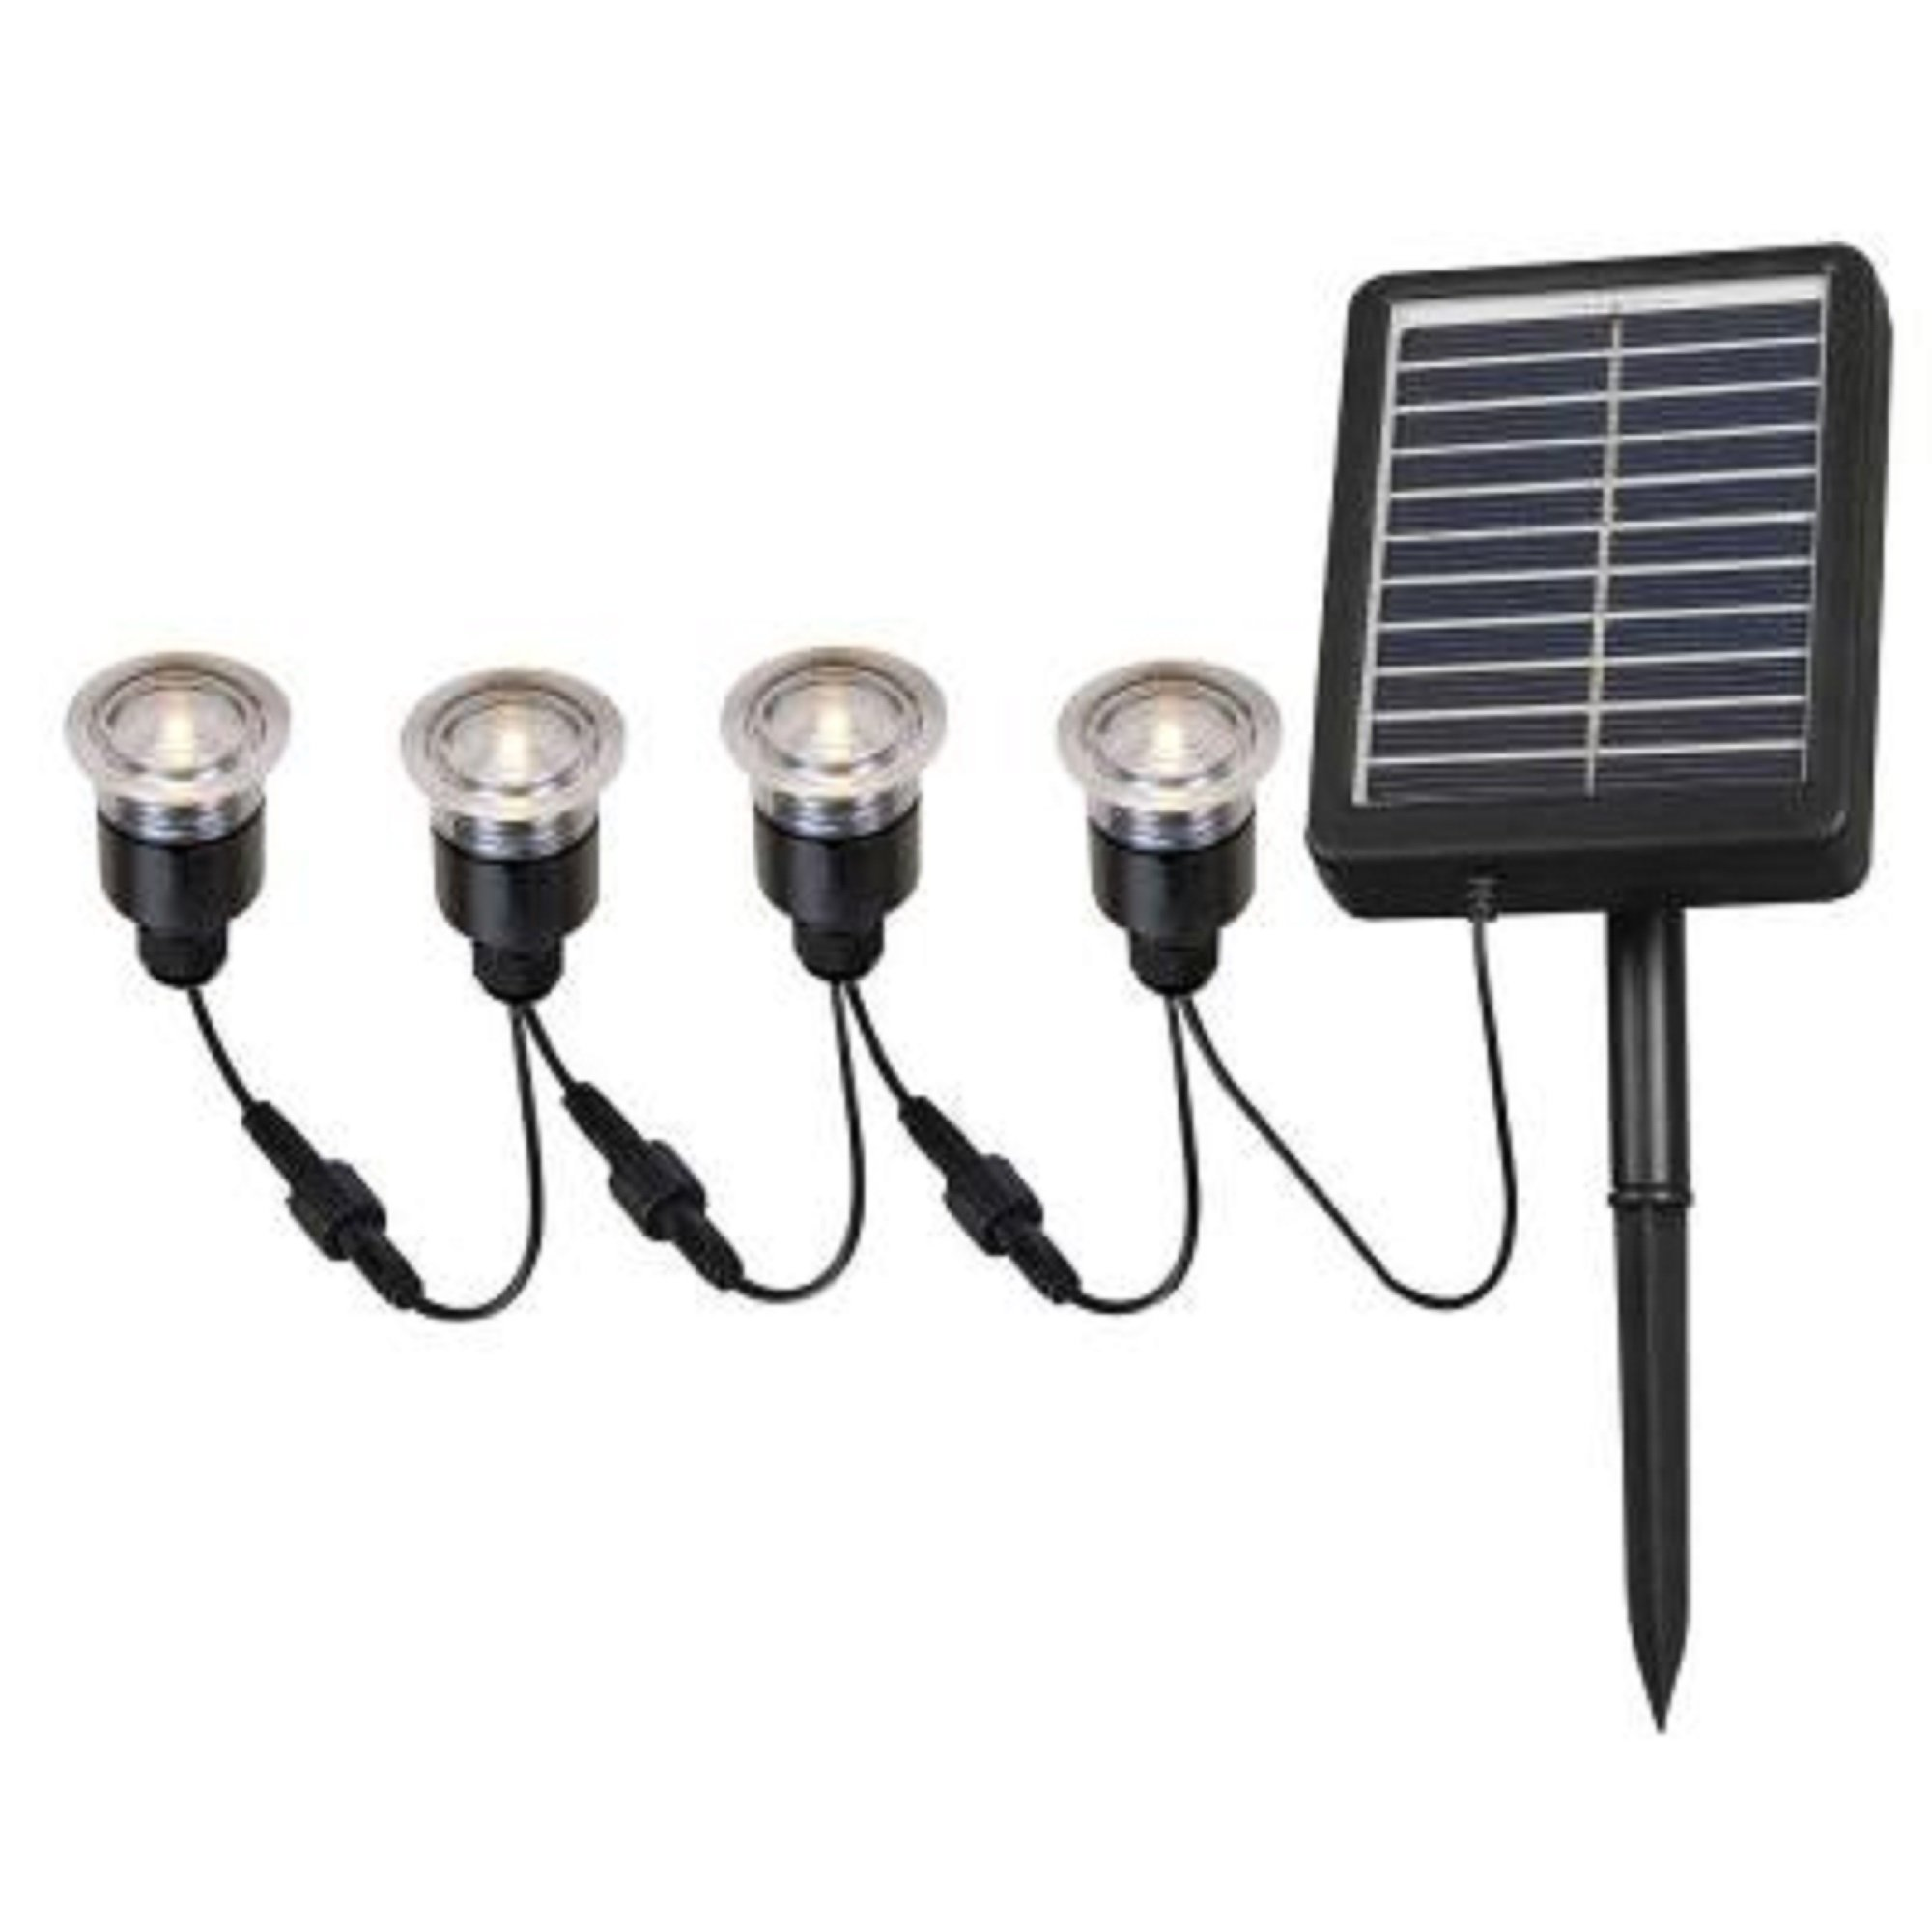 Kenroy Home 2 In. Outdoor Solar String Black Deck Light (4-pack) by Kenroy Home (Image #1)